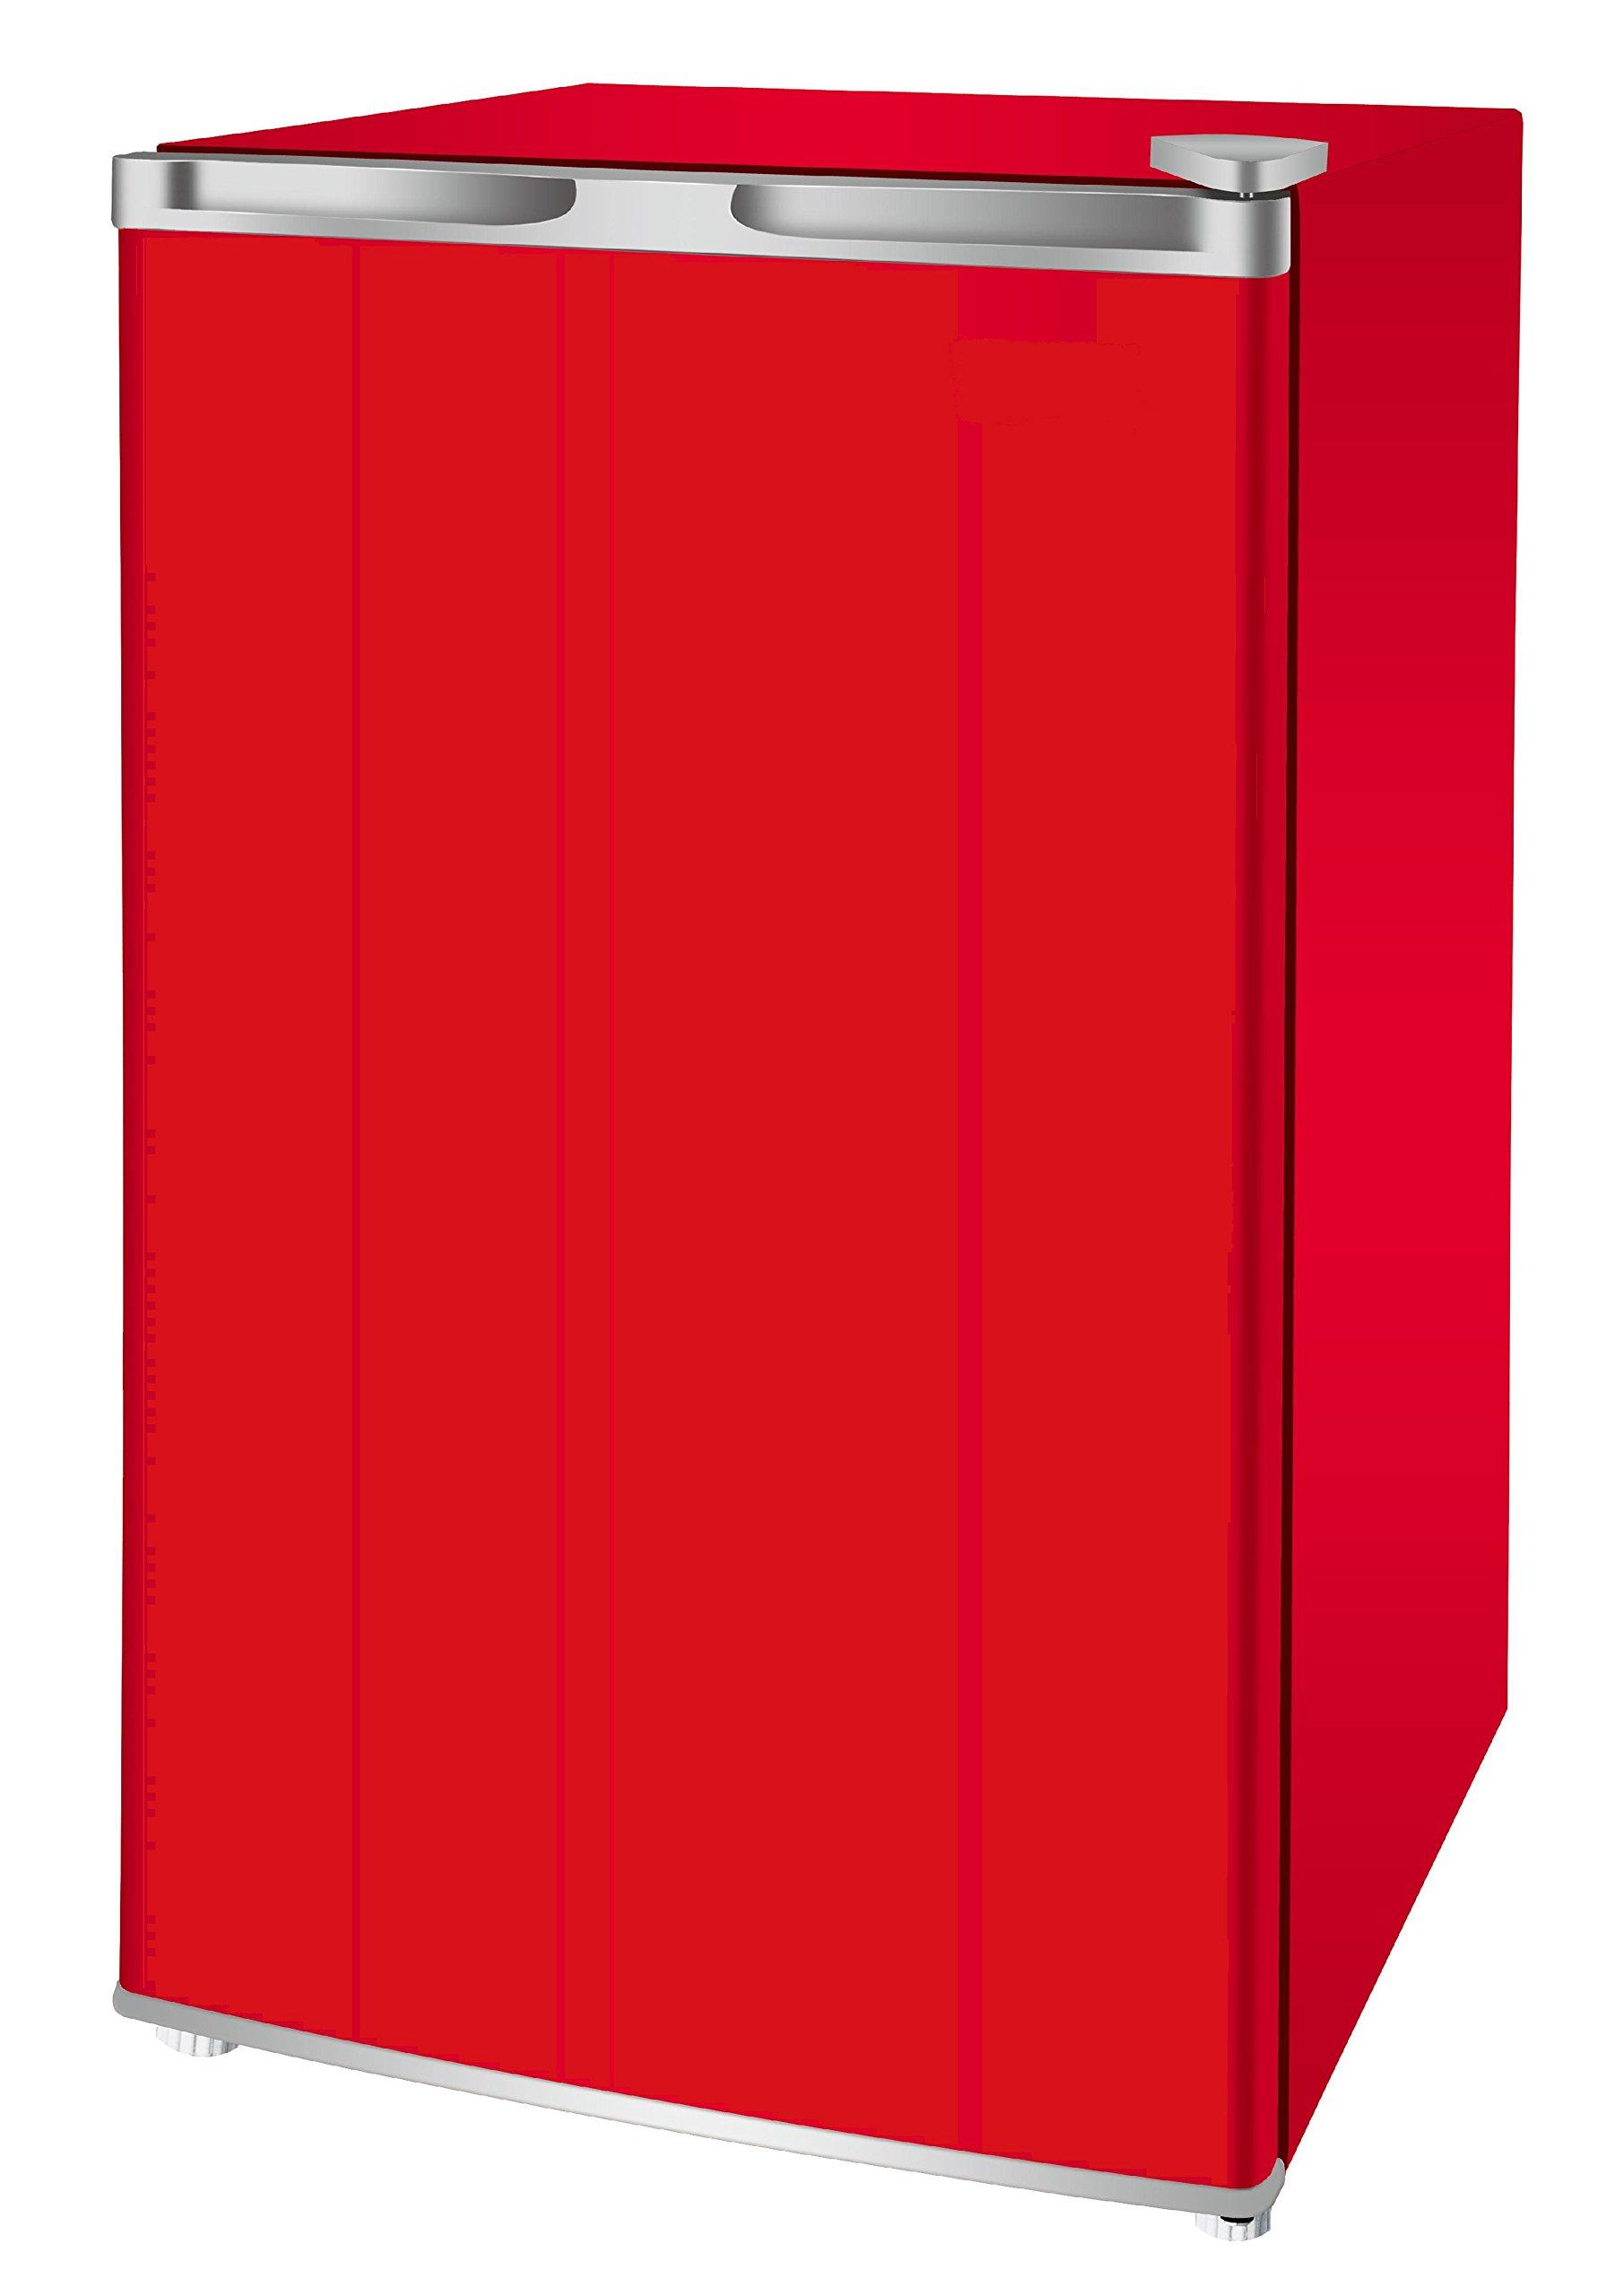 RCA RFR321-FR320/8 IGLOO Mini Refrigerator, 3.2 Cu Ft Fridge, Red